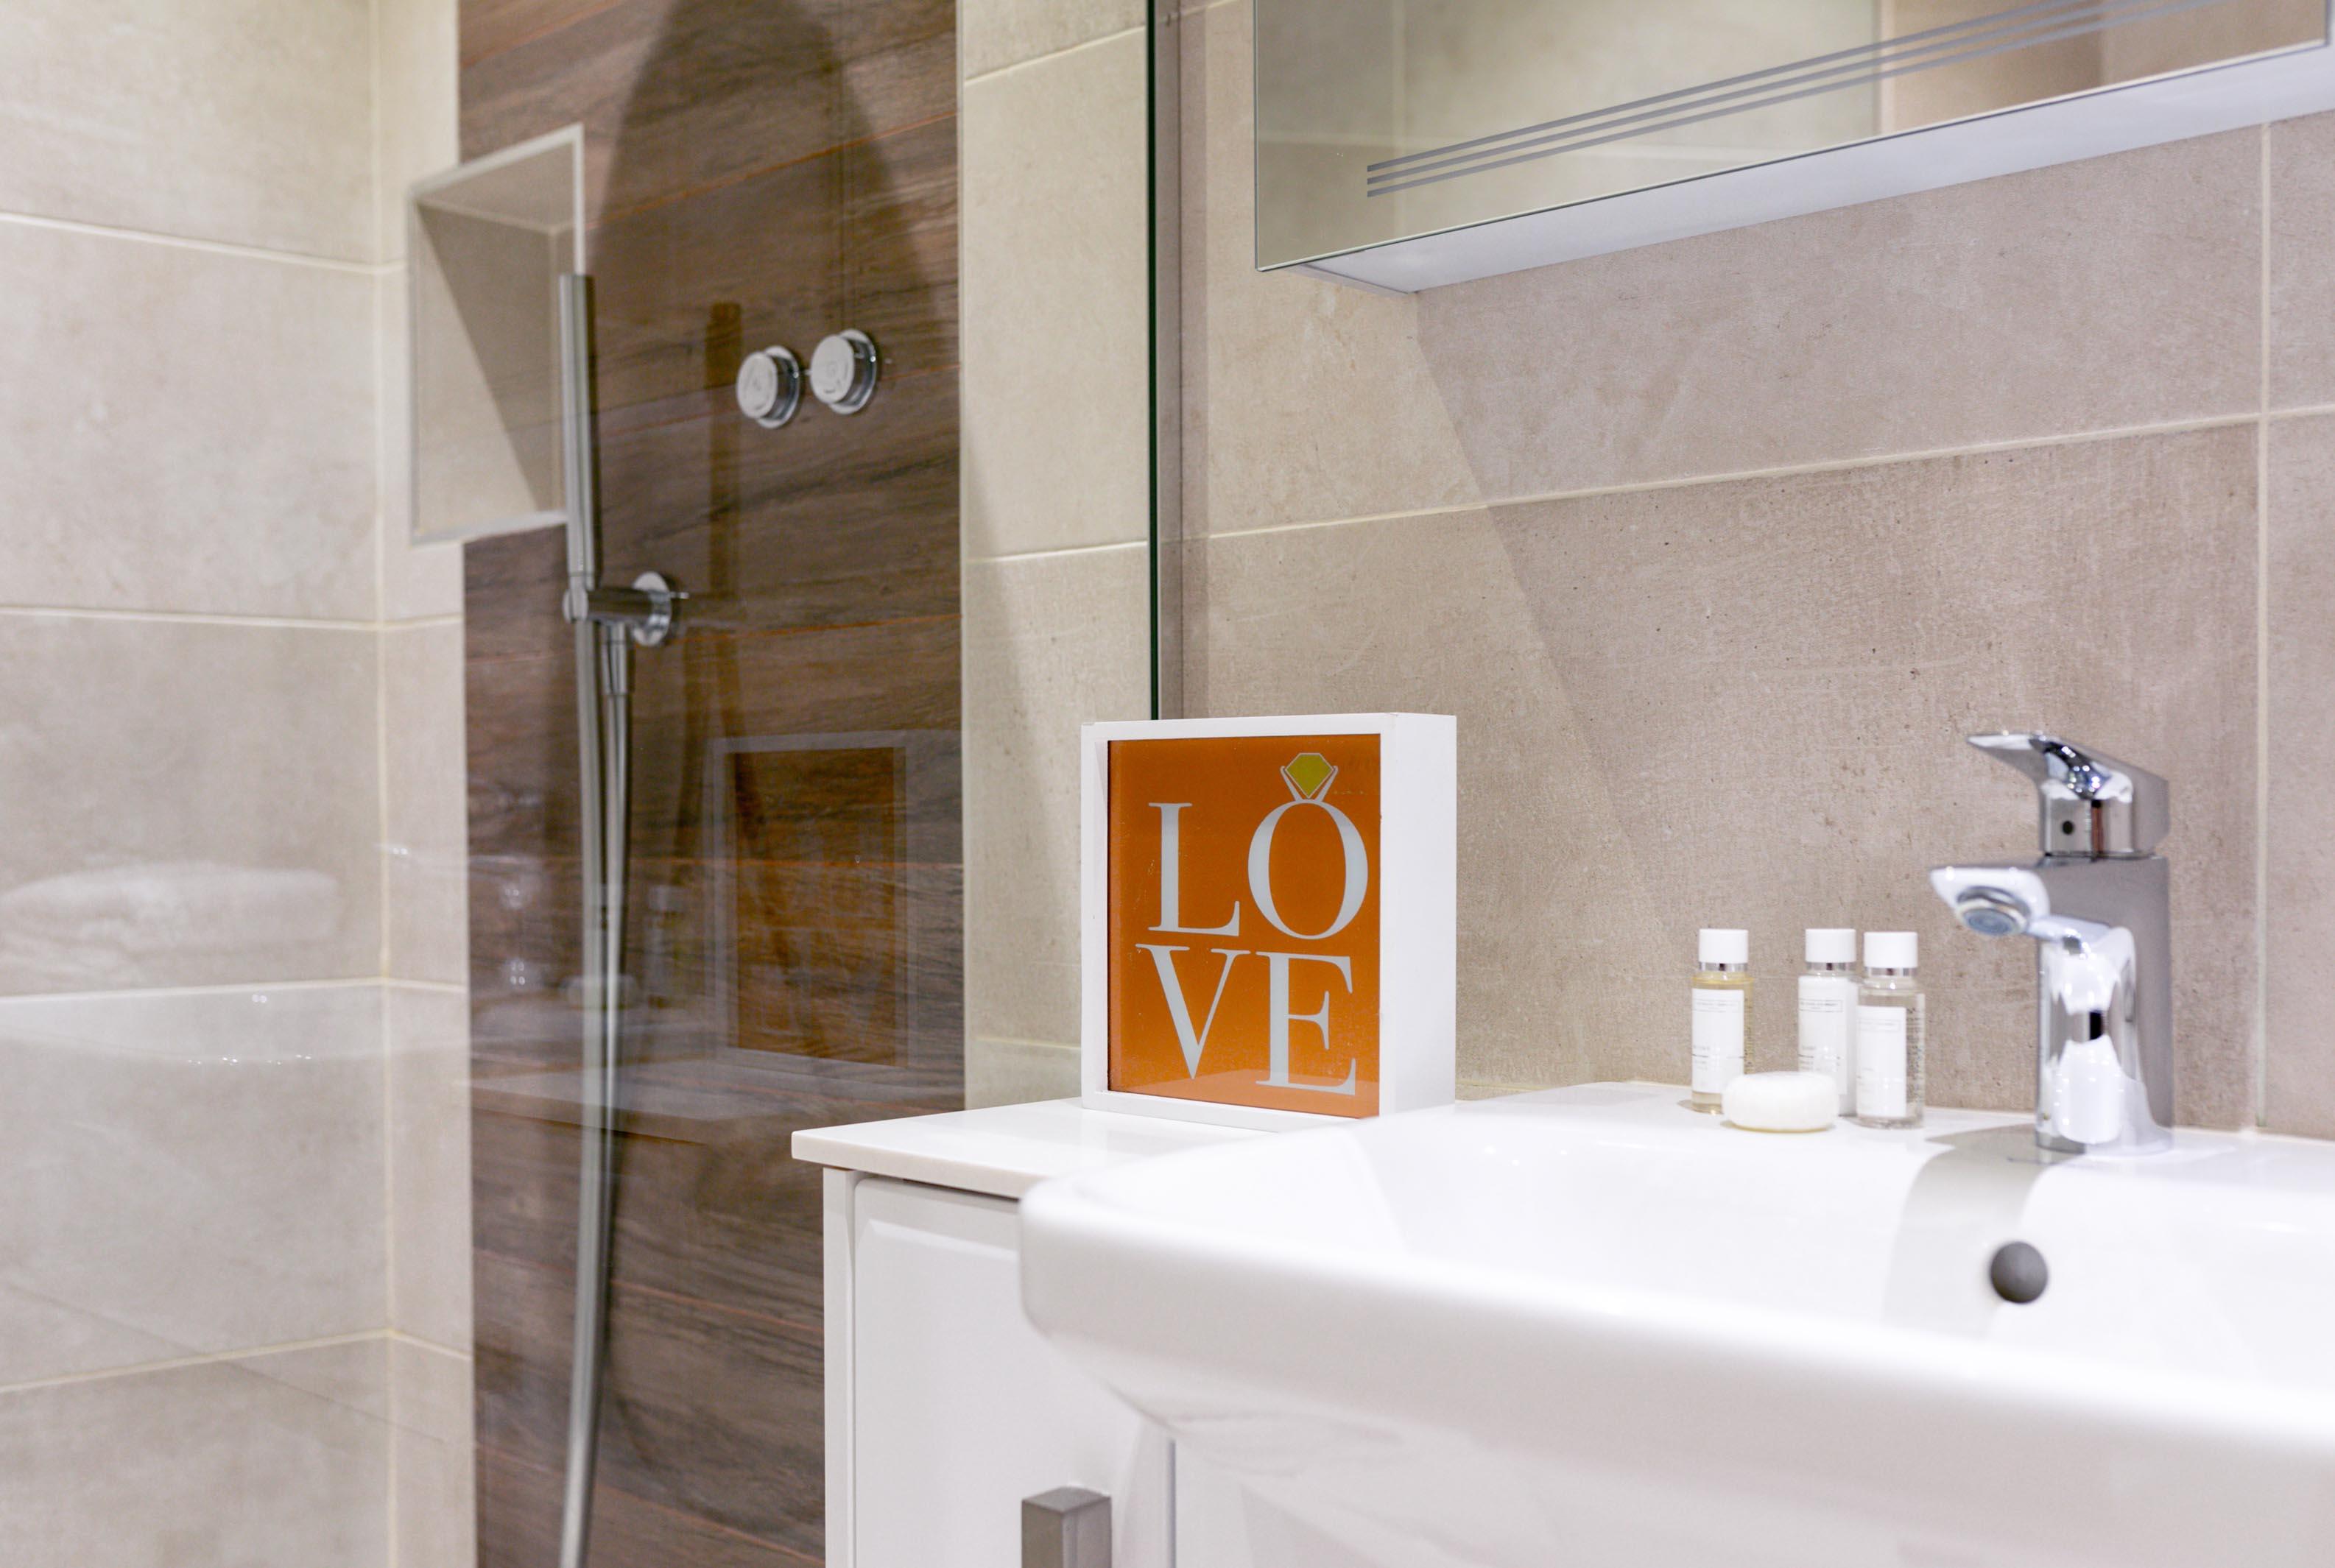 Lovelydays luxury service apartment rental - London - Fitzrovia - Wells Mews B - Lovelysuite - 2 bedrooms - 2 bathrooms - Lovely shower - d1ac917ca194 - Lovelydays